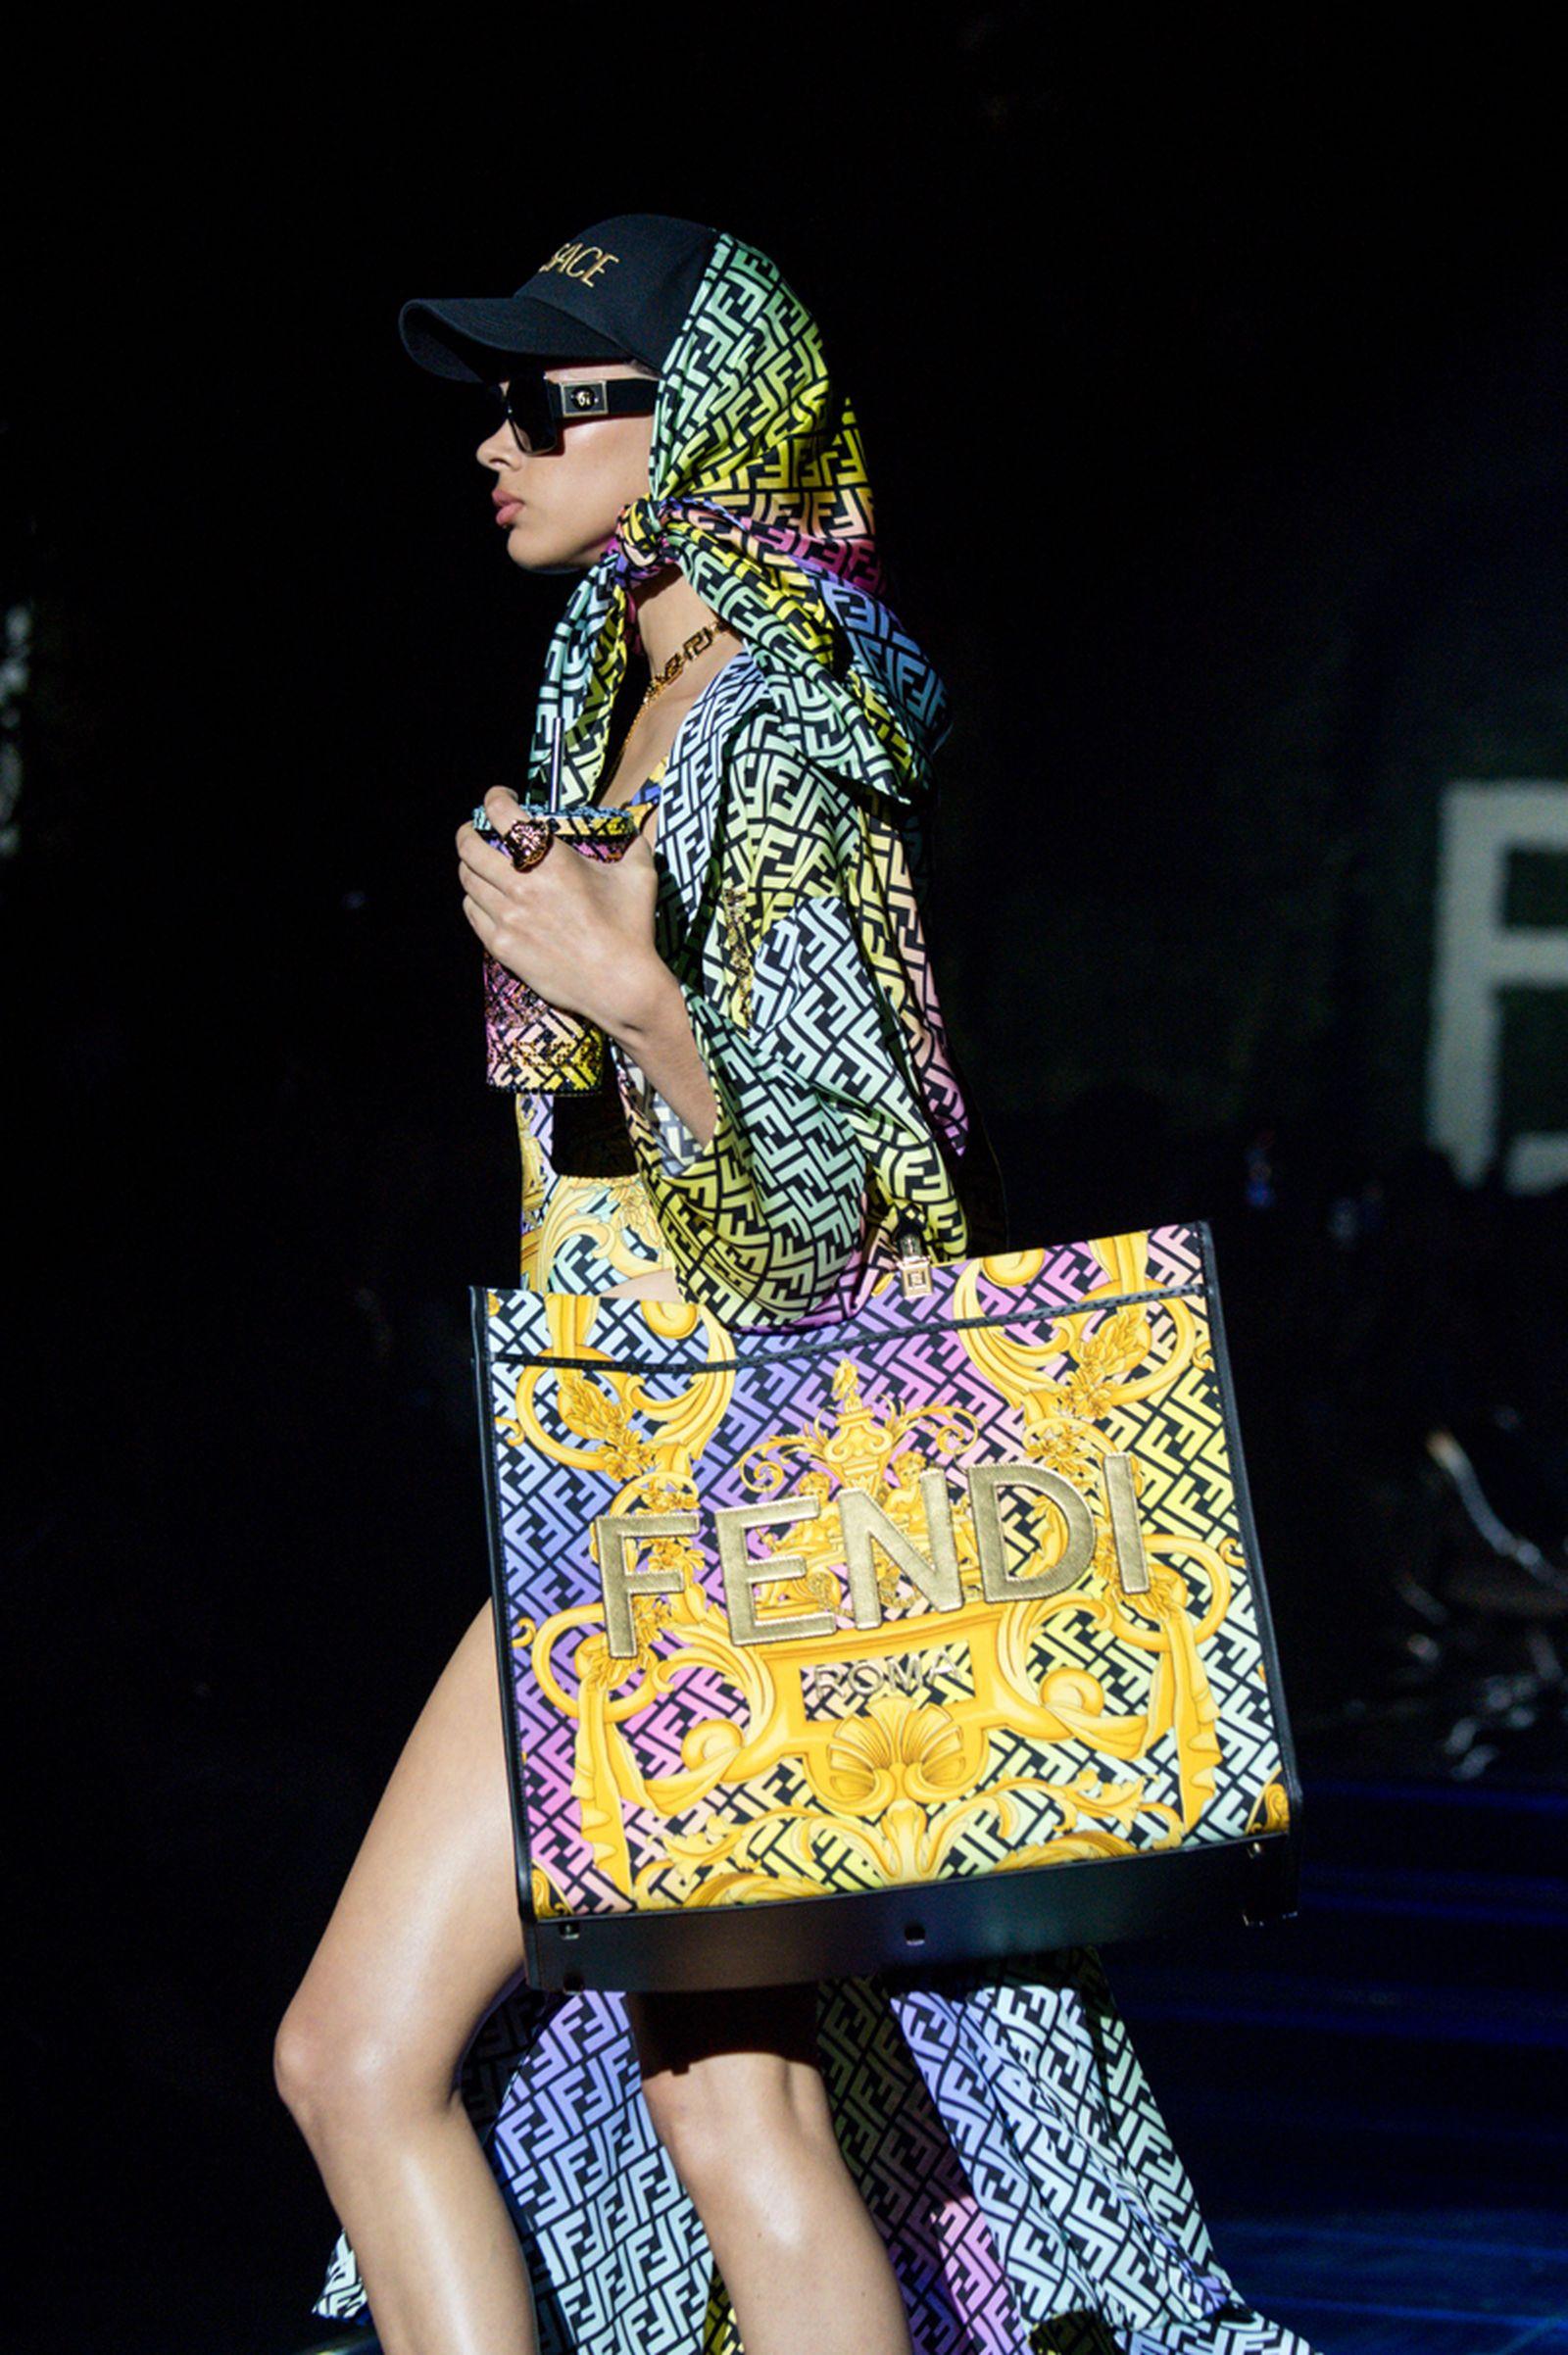 versace-fendi-collab- (27)